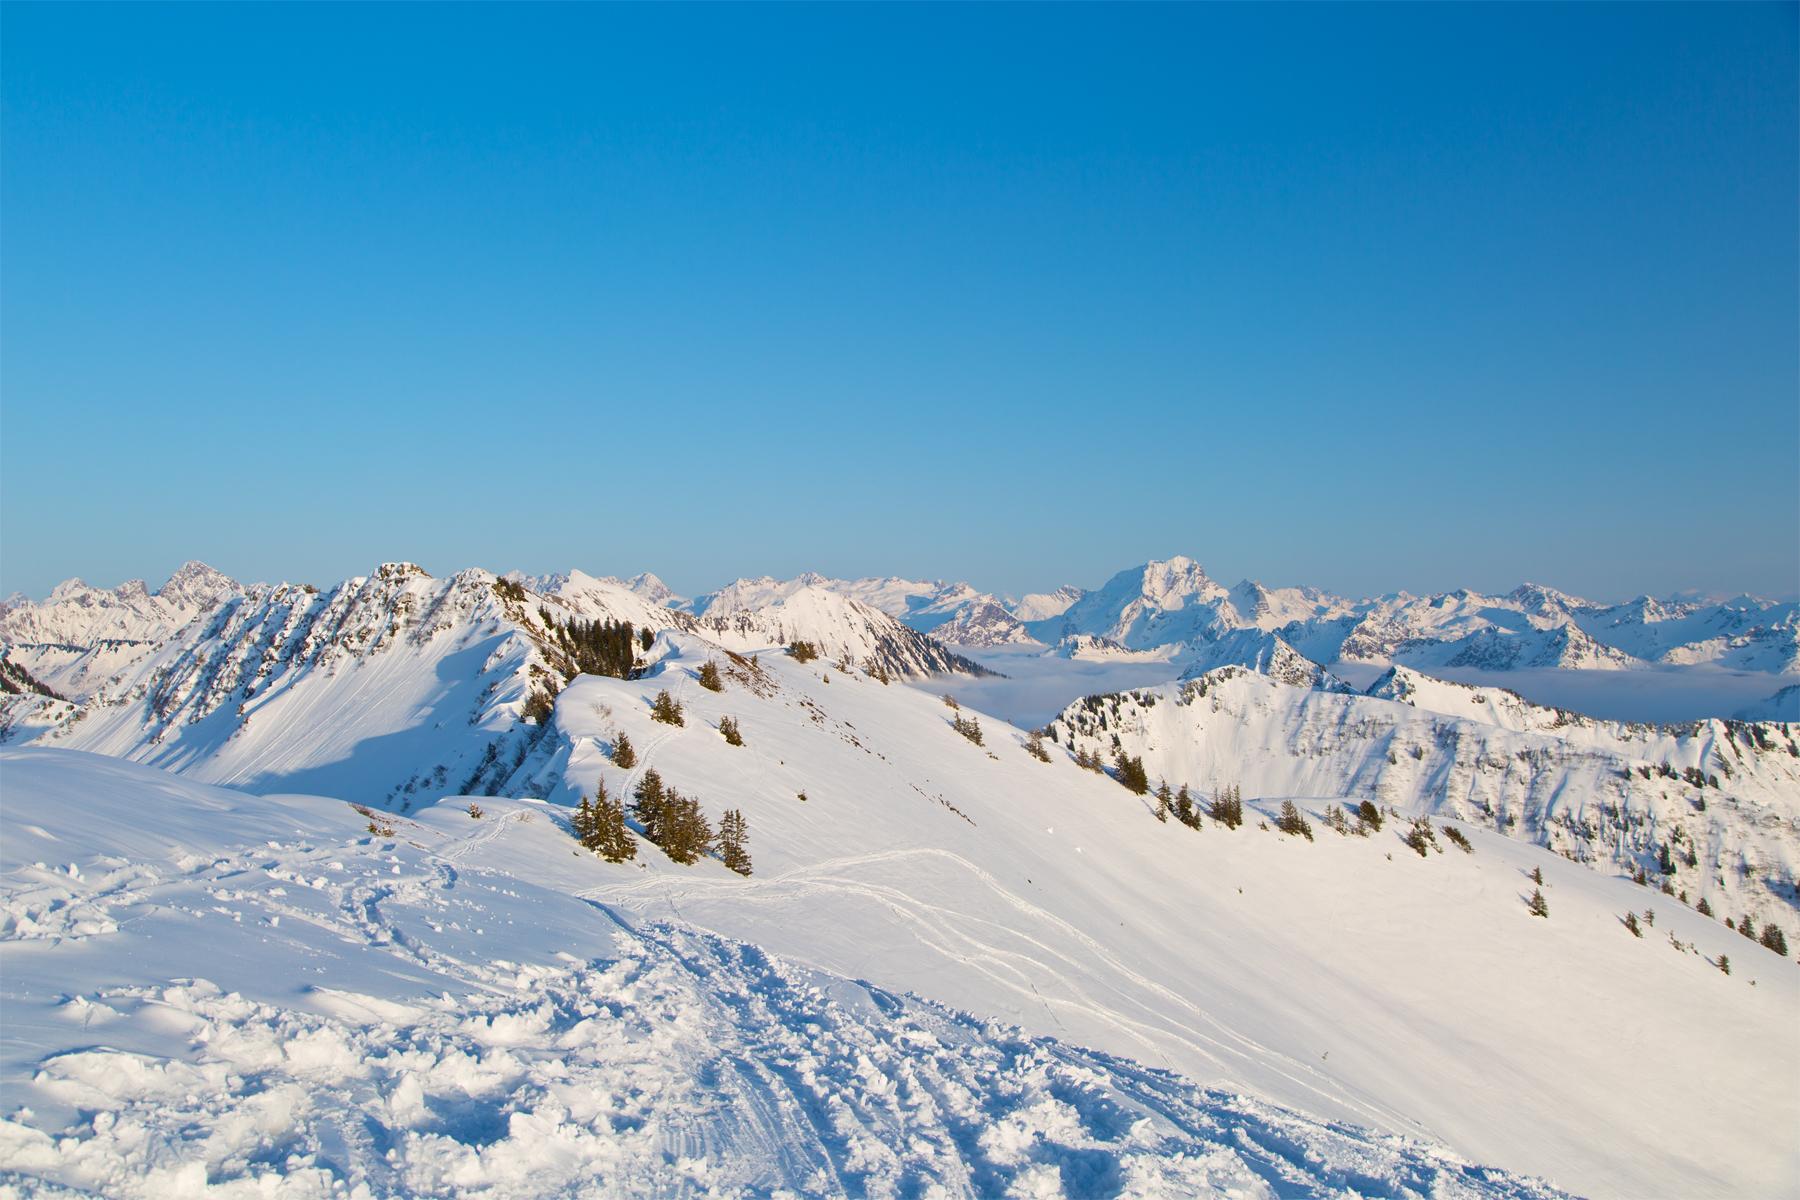 Bergpanorama, links Widderstein, Mitte rechts Rote Wand